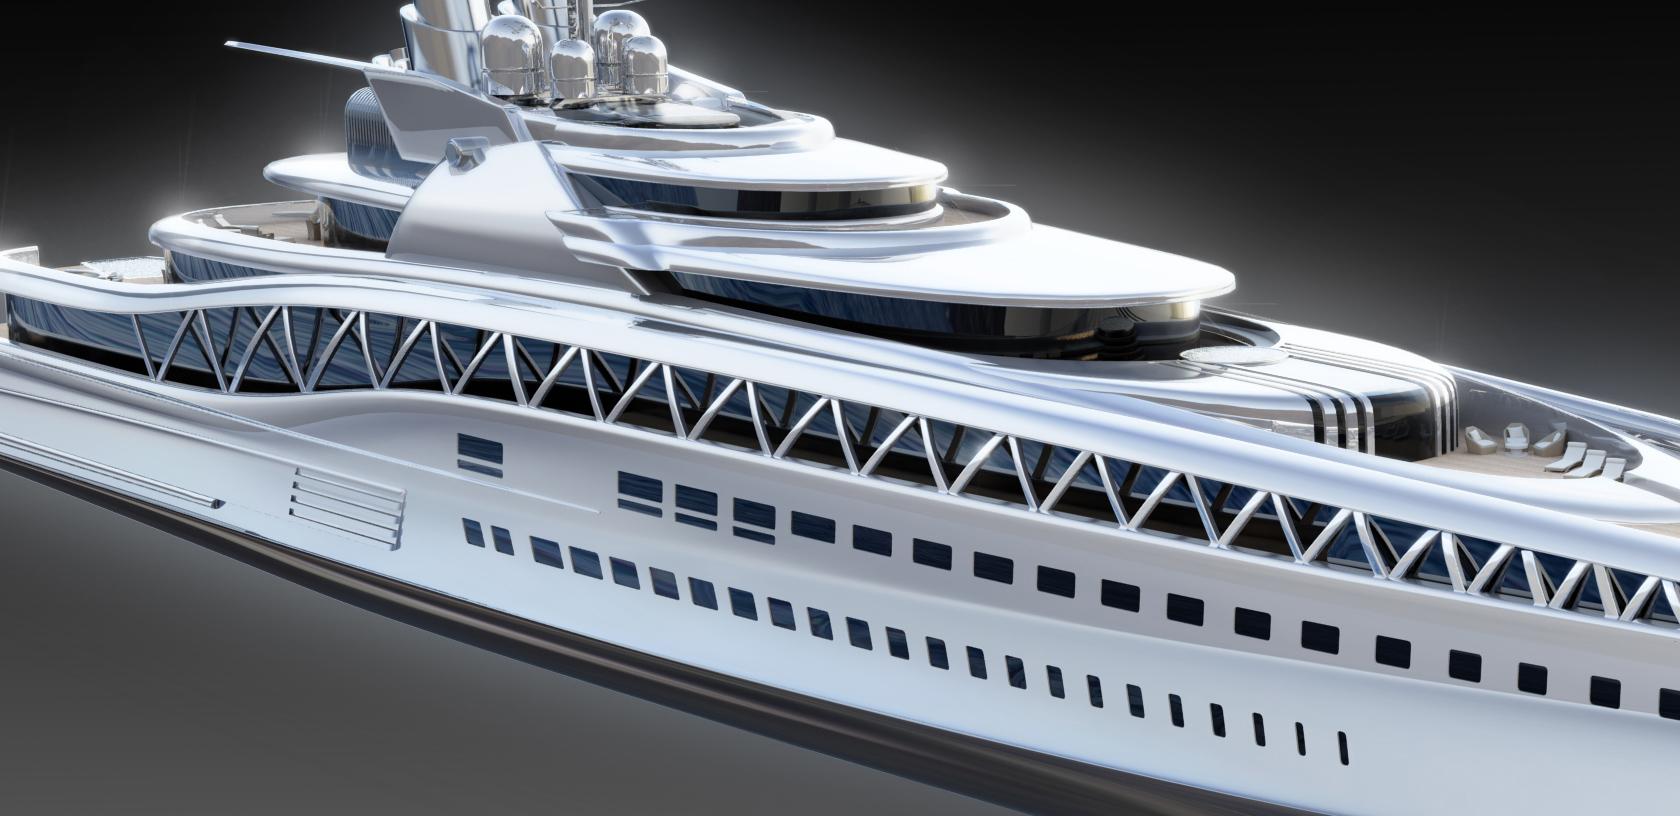 Ken Freivokh Design Superyacht Stylists Architects And